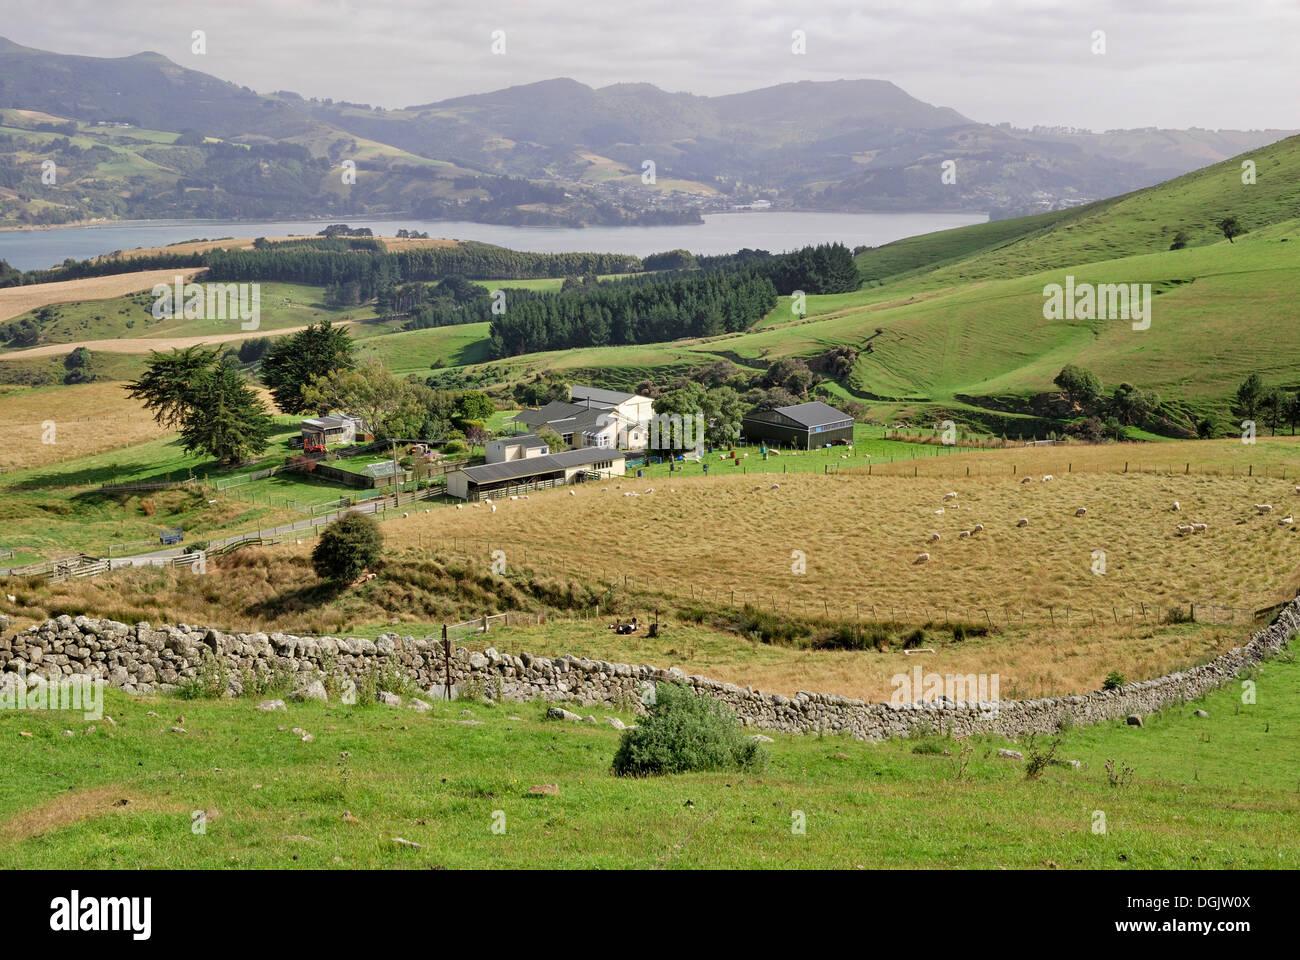 Sheep farm, Otago Peninsula, Castlewood Road, Dunedin, South Island, New Zealand Stock Photo